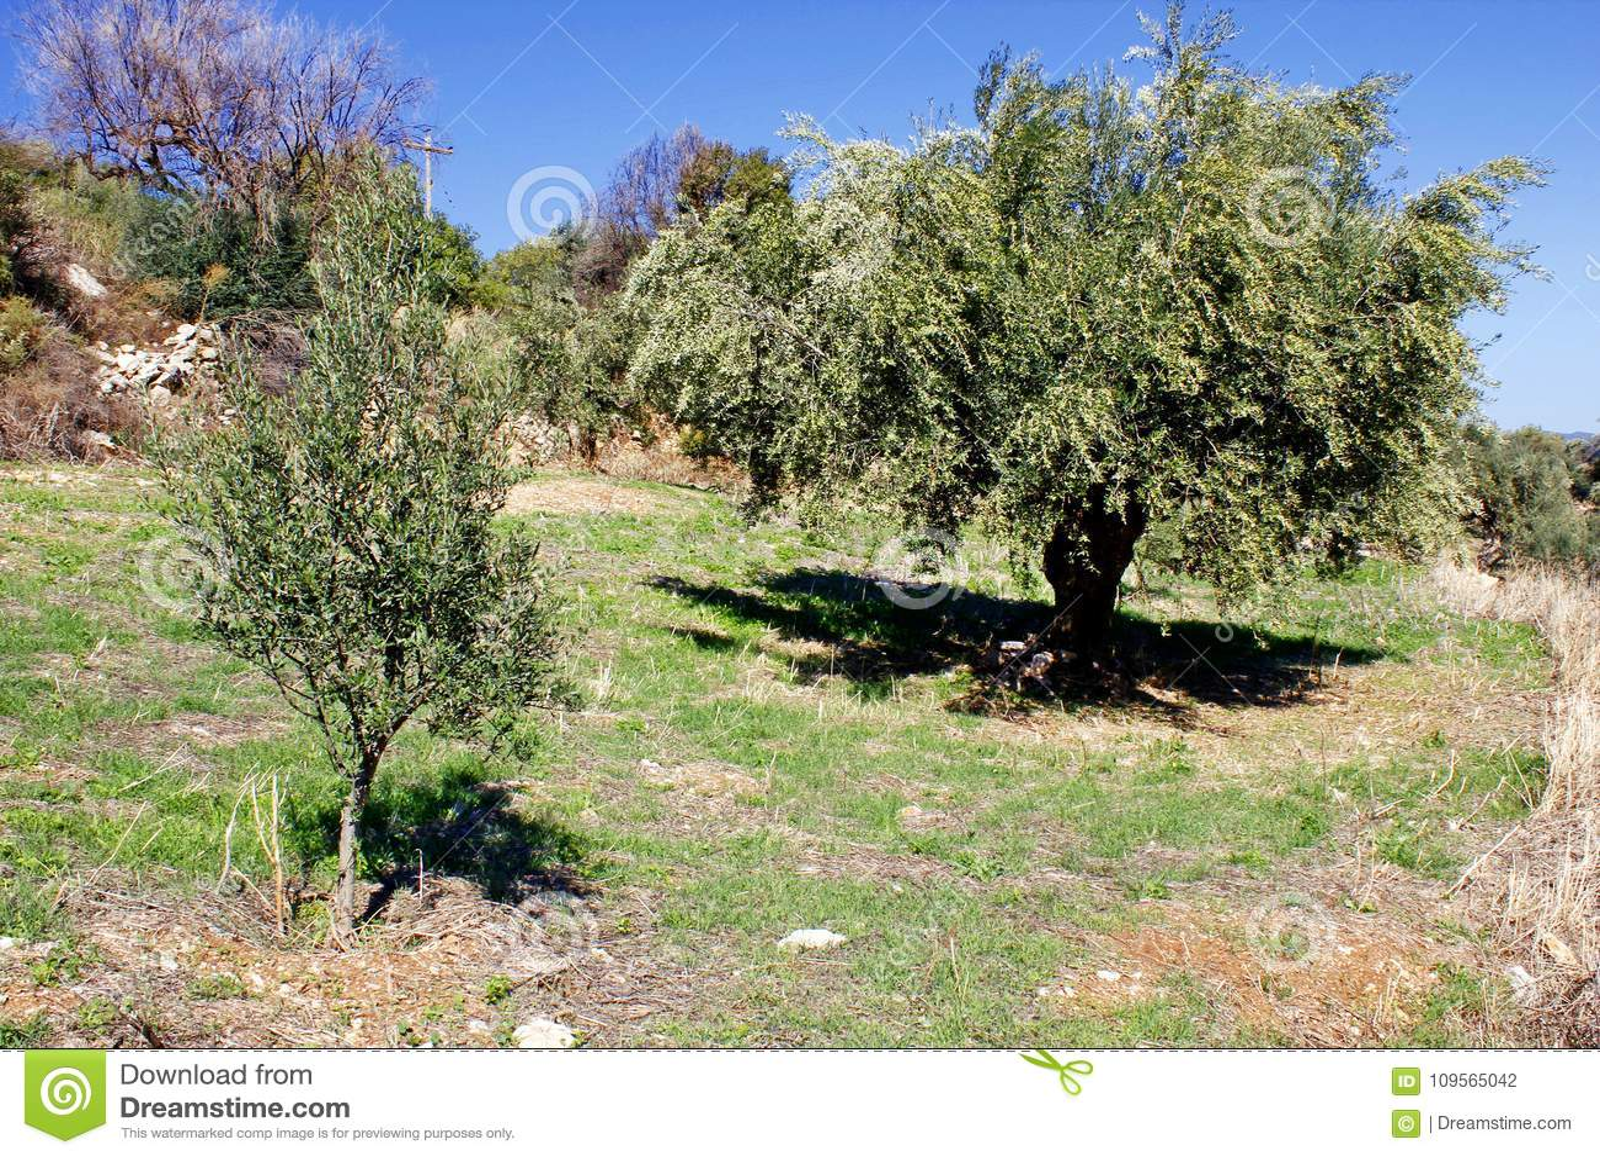 Olive grove in Kalamata, Peloponnese region, Greece.